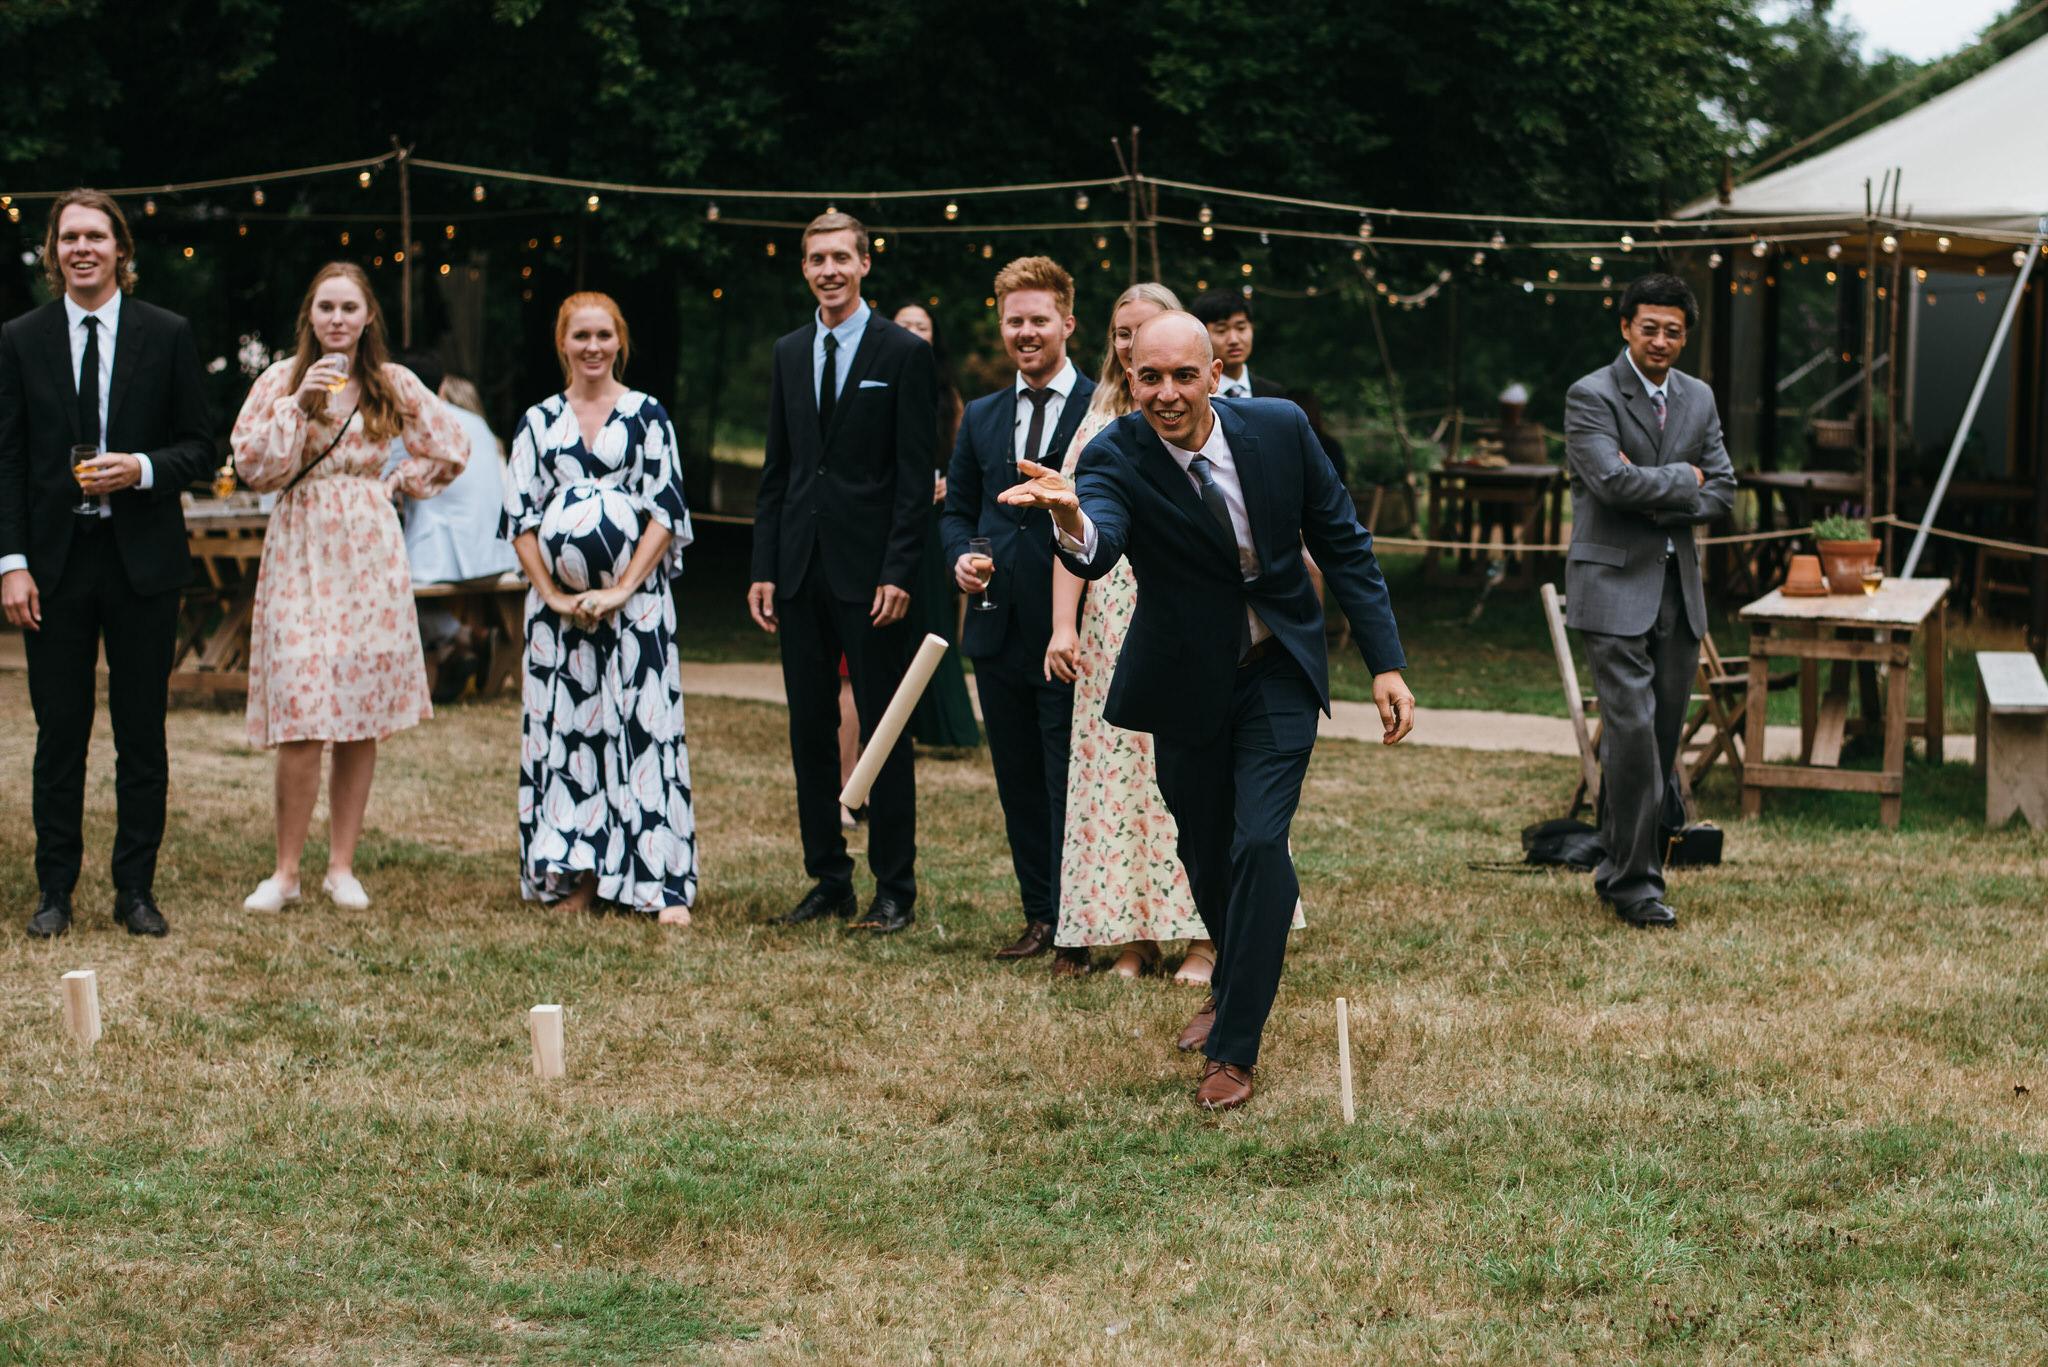 Guests play wedding games at The dreys